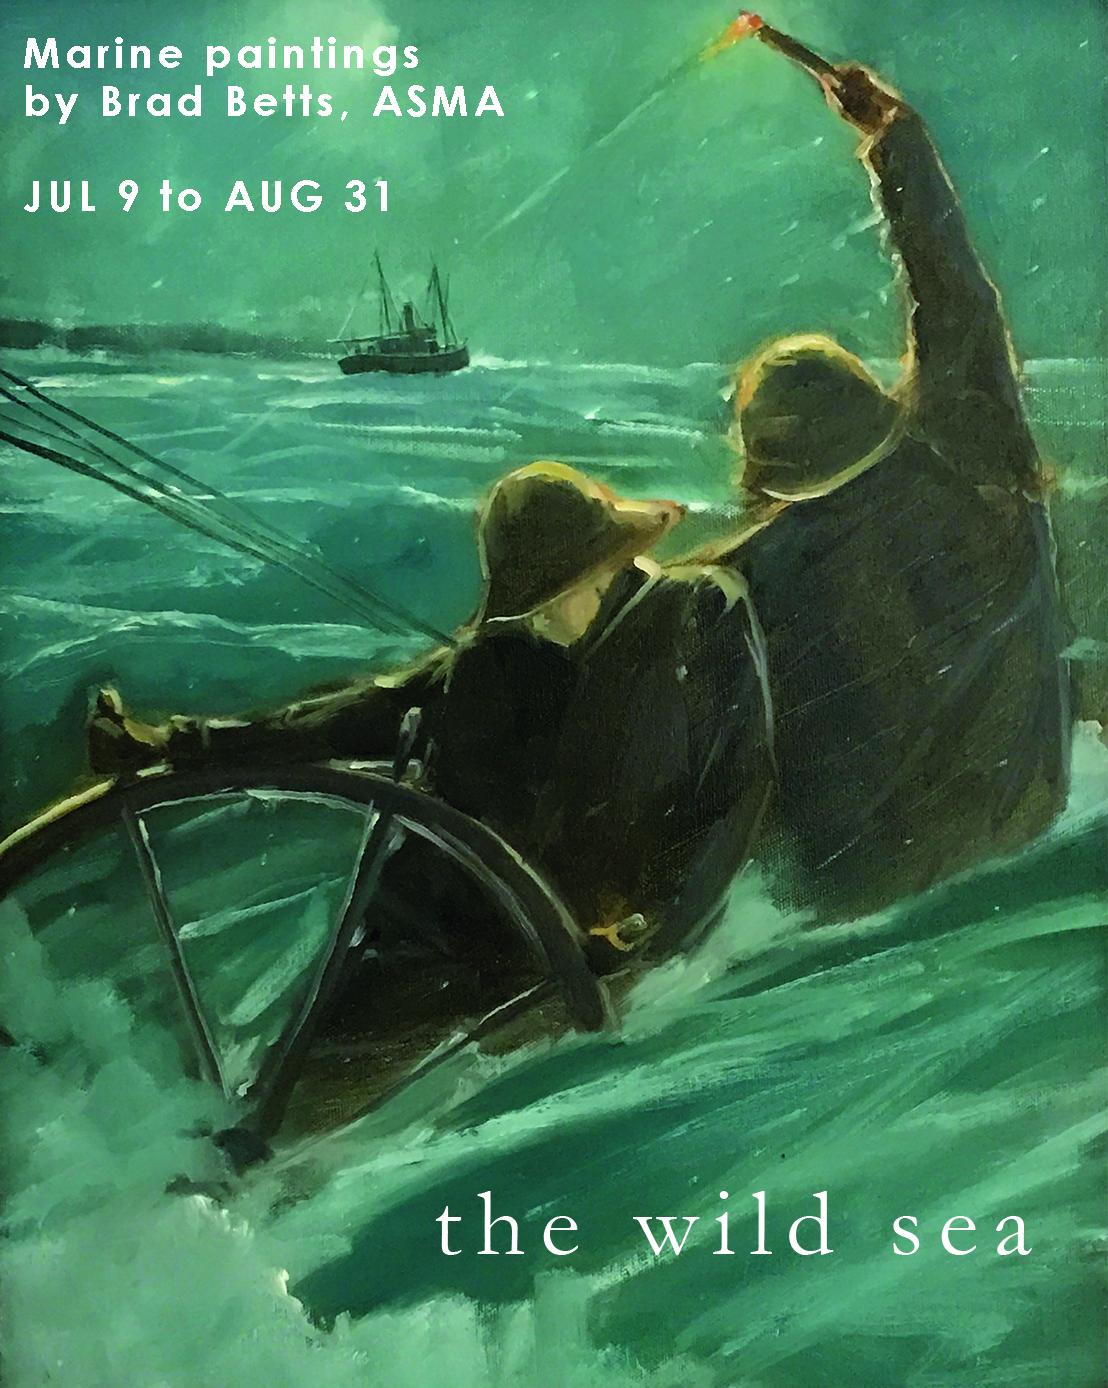 the wild sea poster.jpg